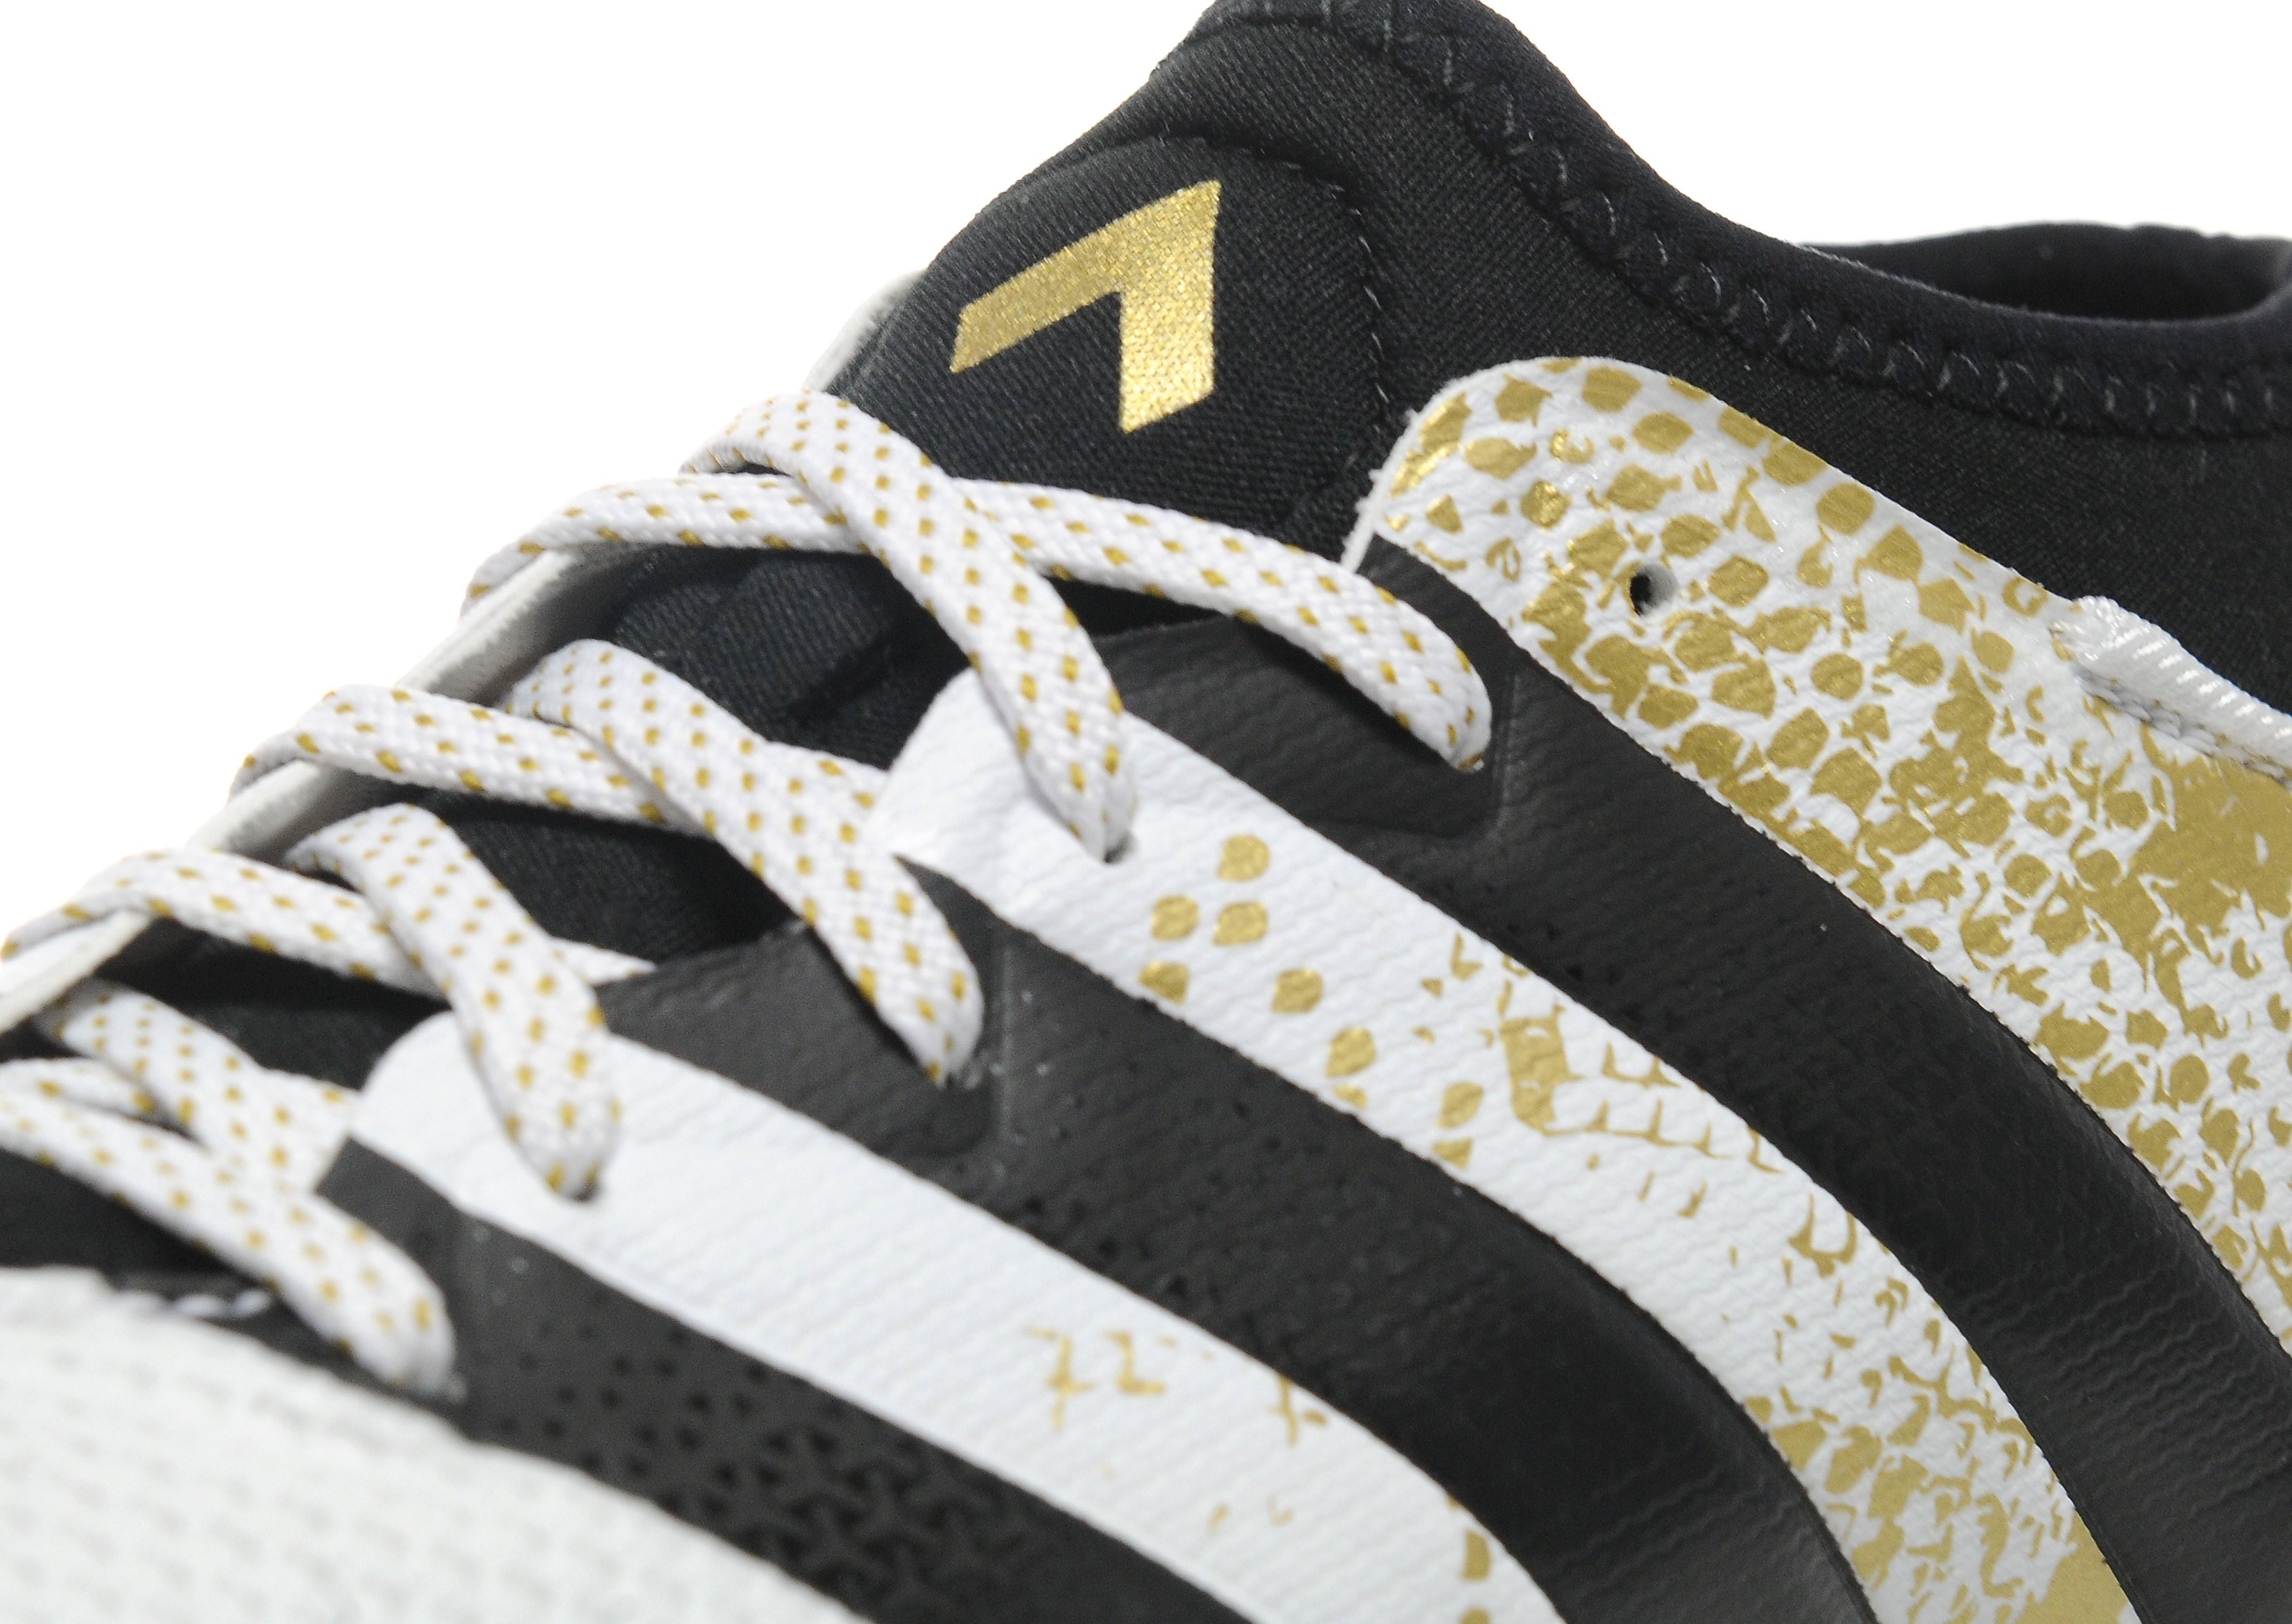 adidas Stellar Ace 16.3 Primemesh FG Junior